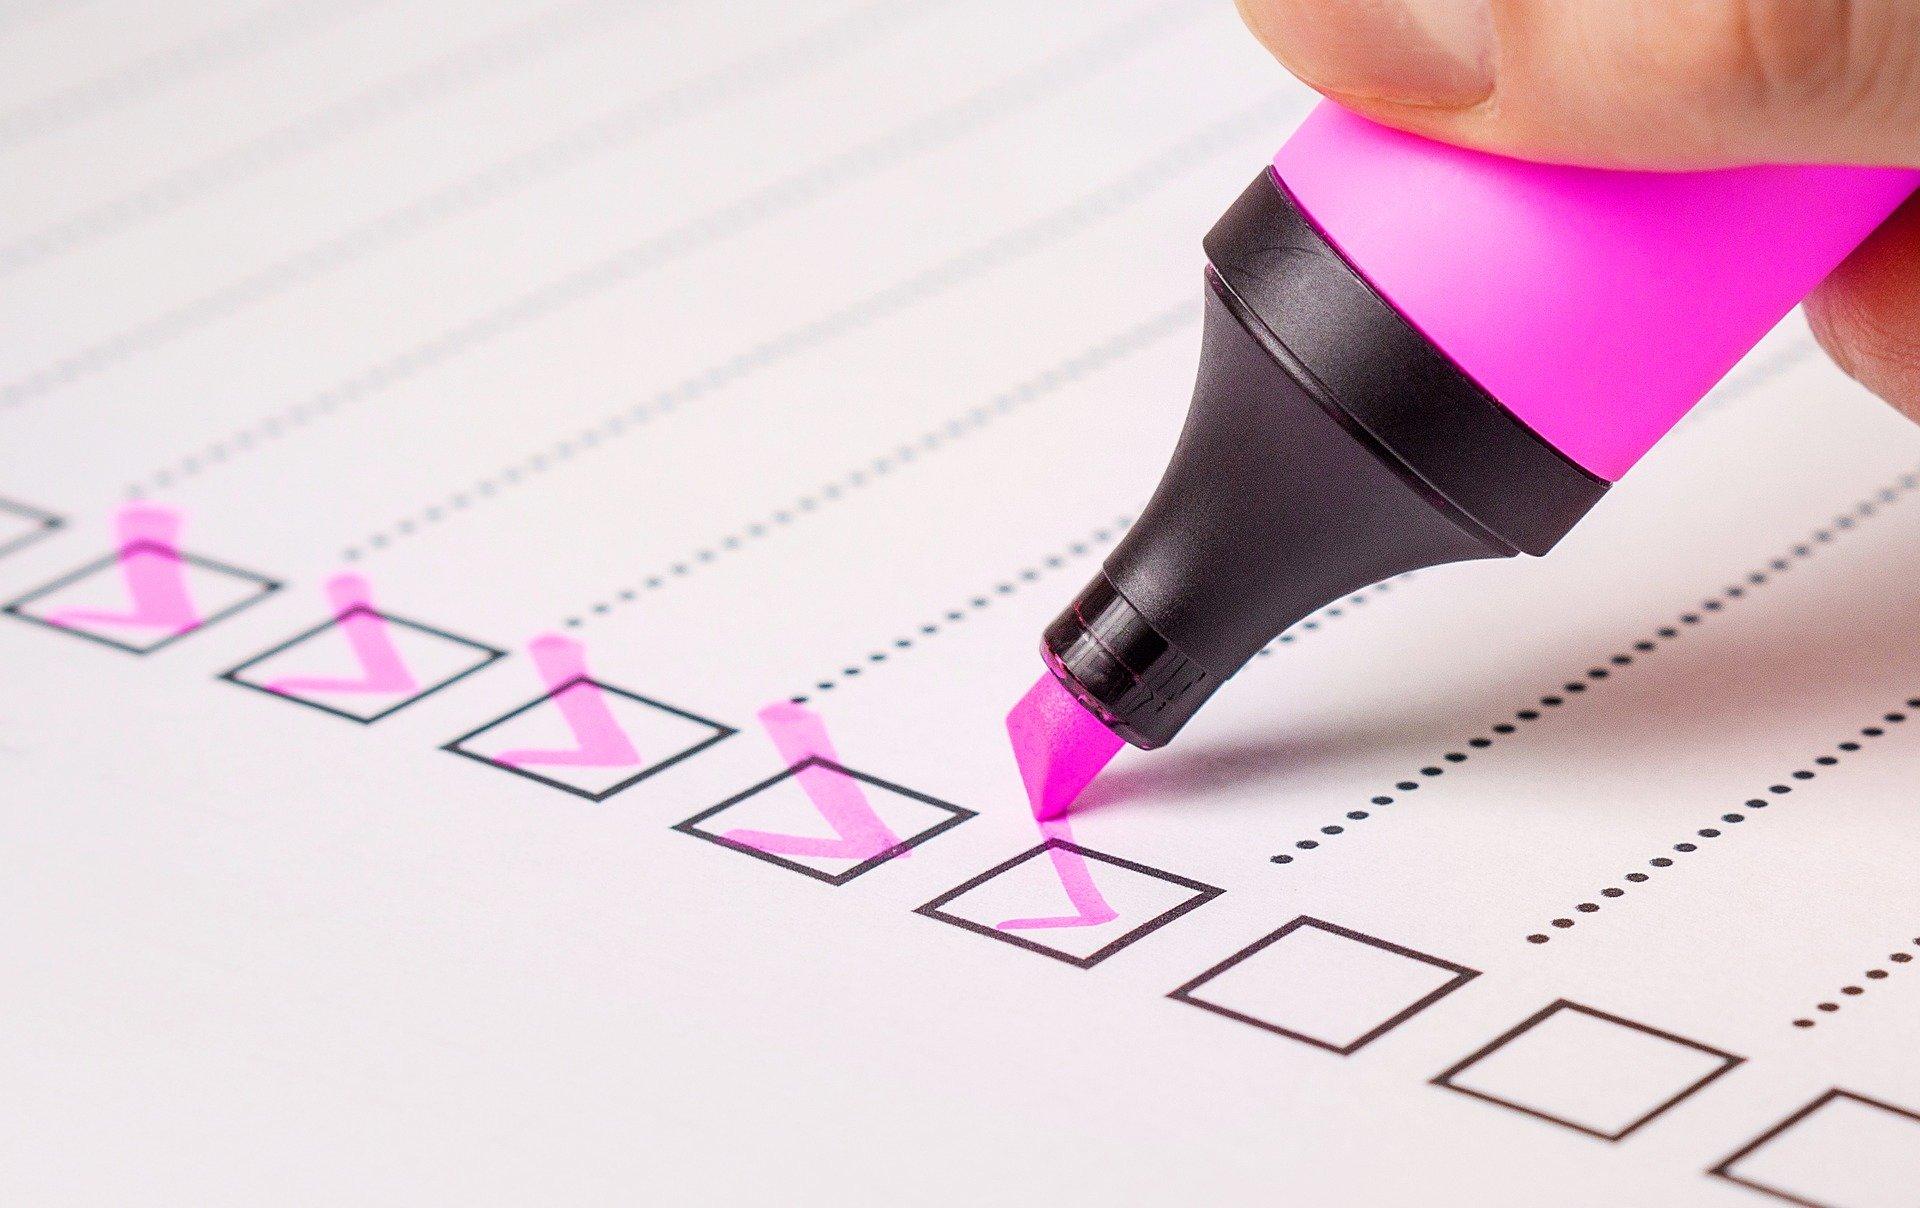 Checklist with pink marker